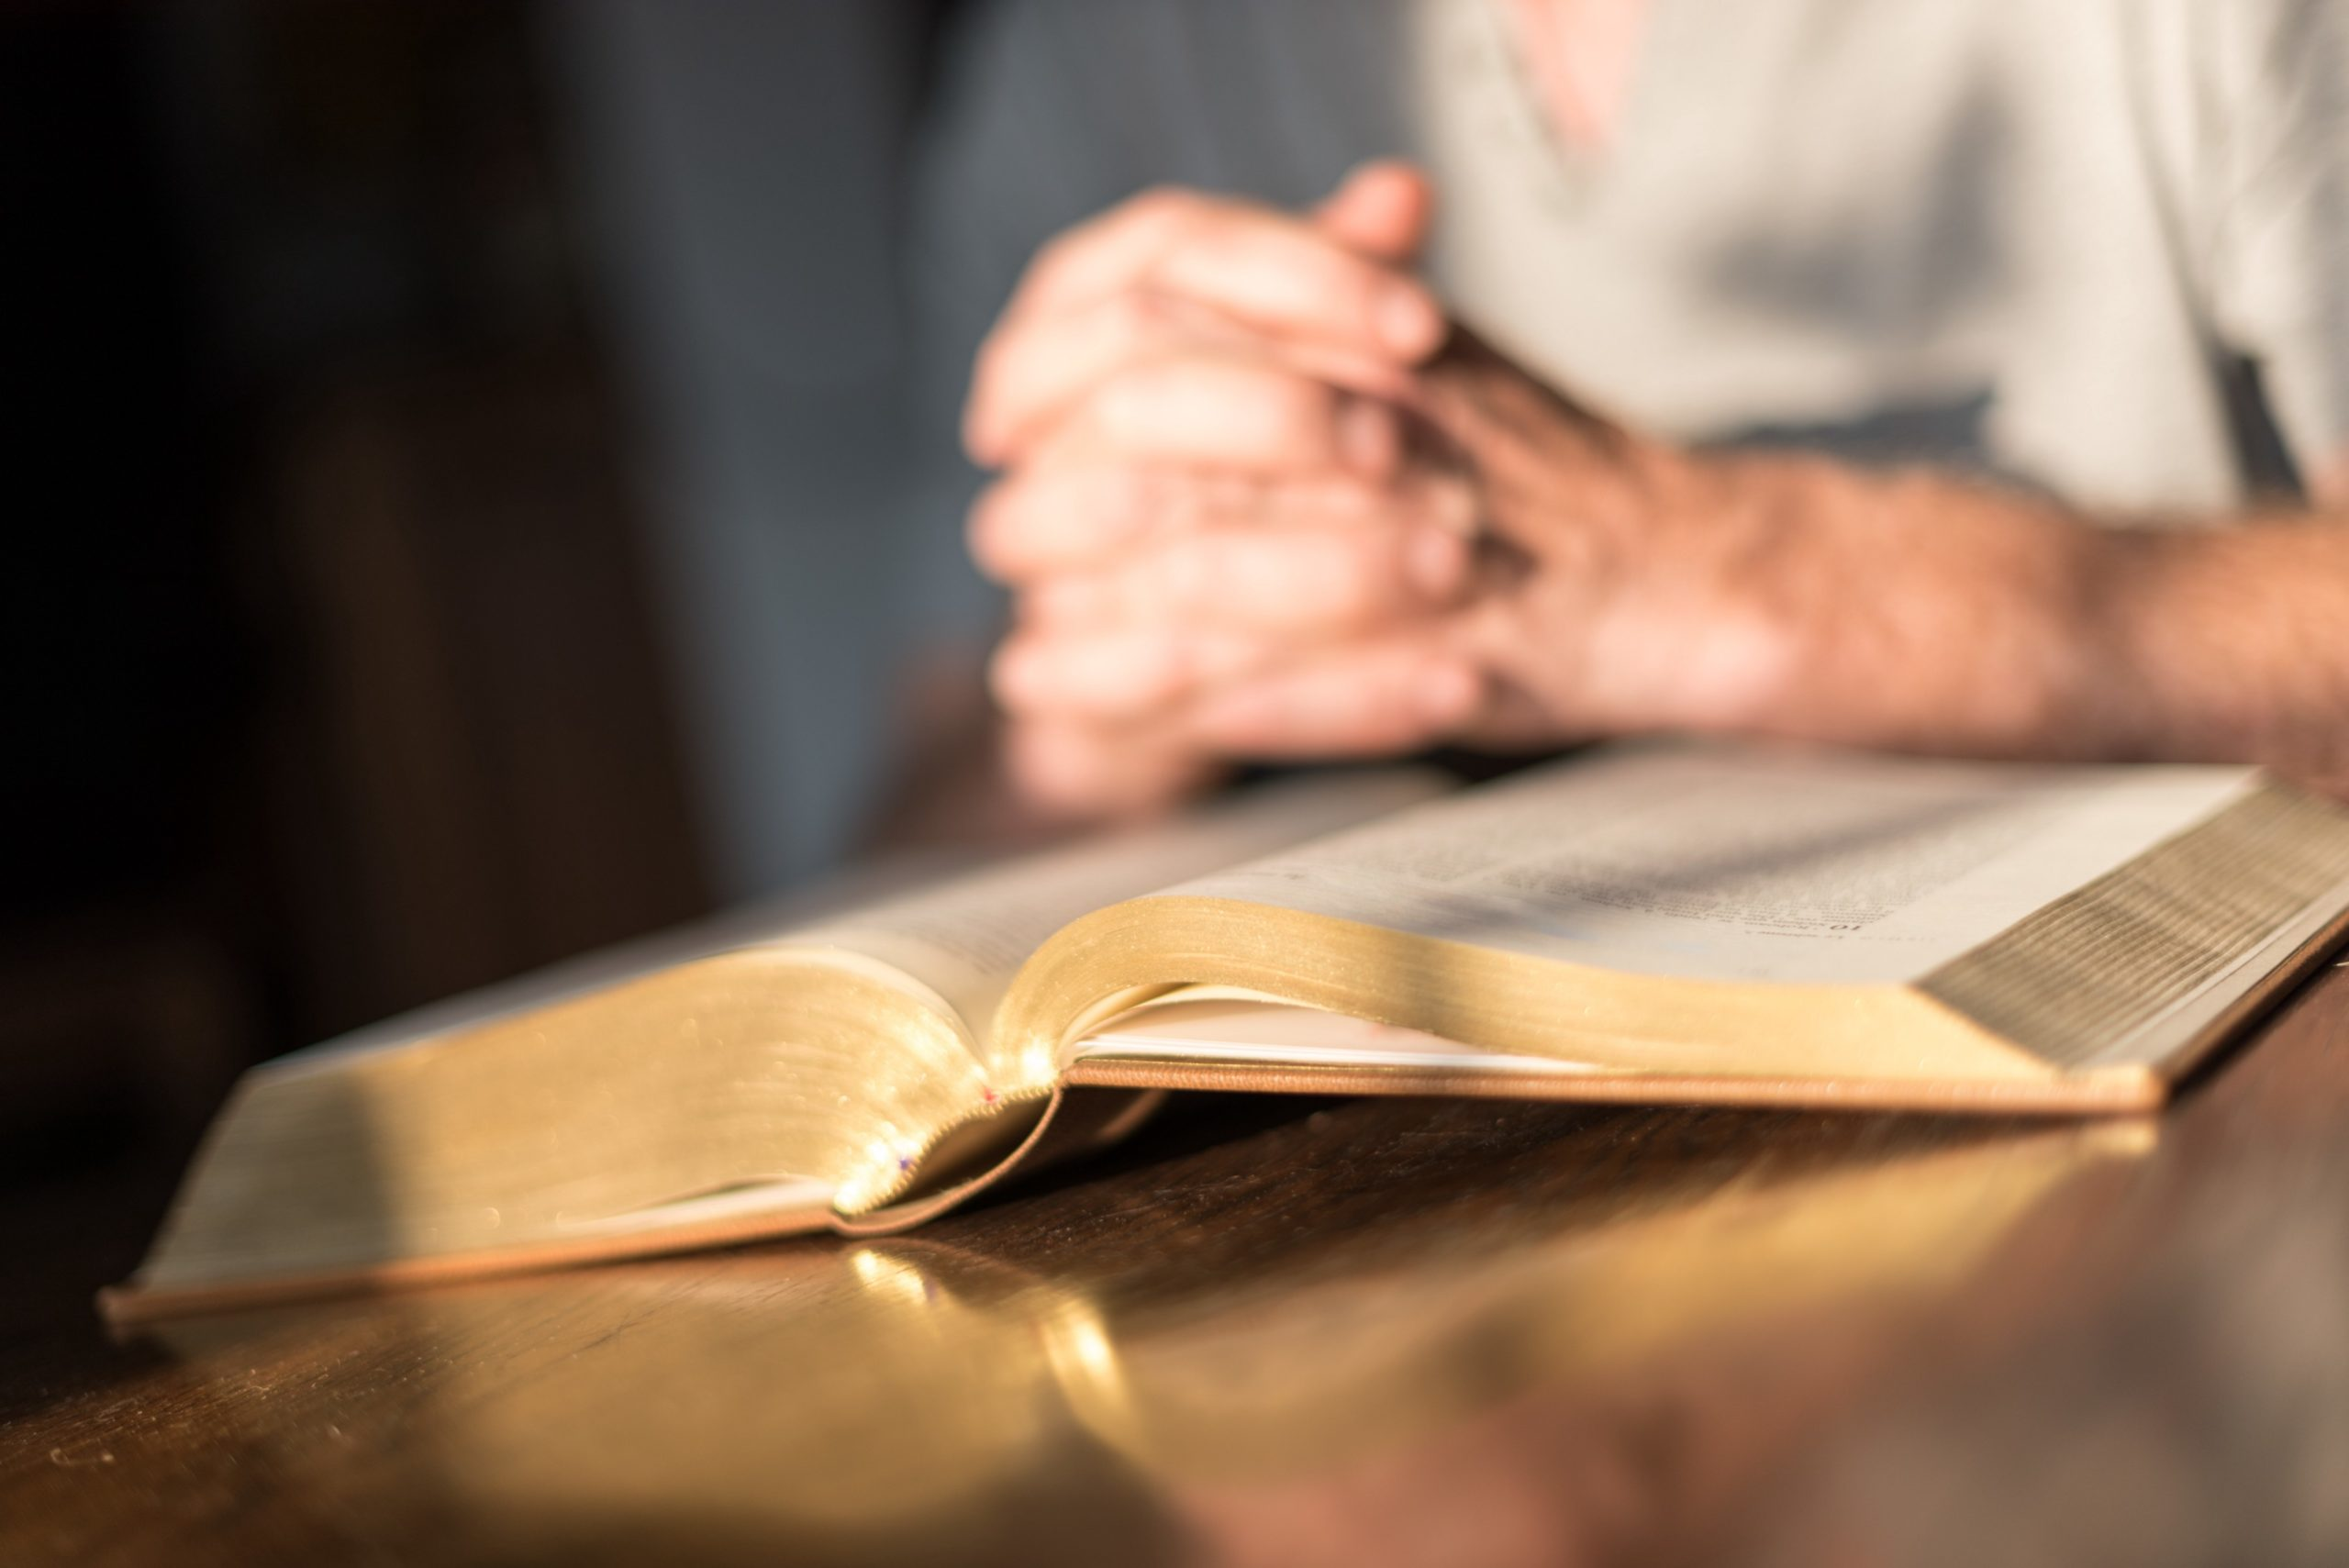 Verdades Fundamentales de la Fe Cristiana